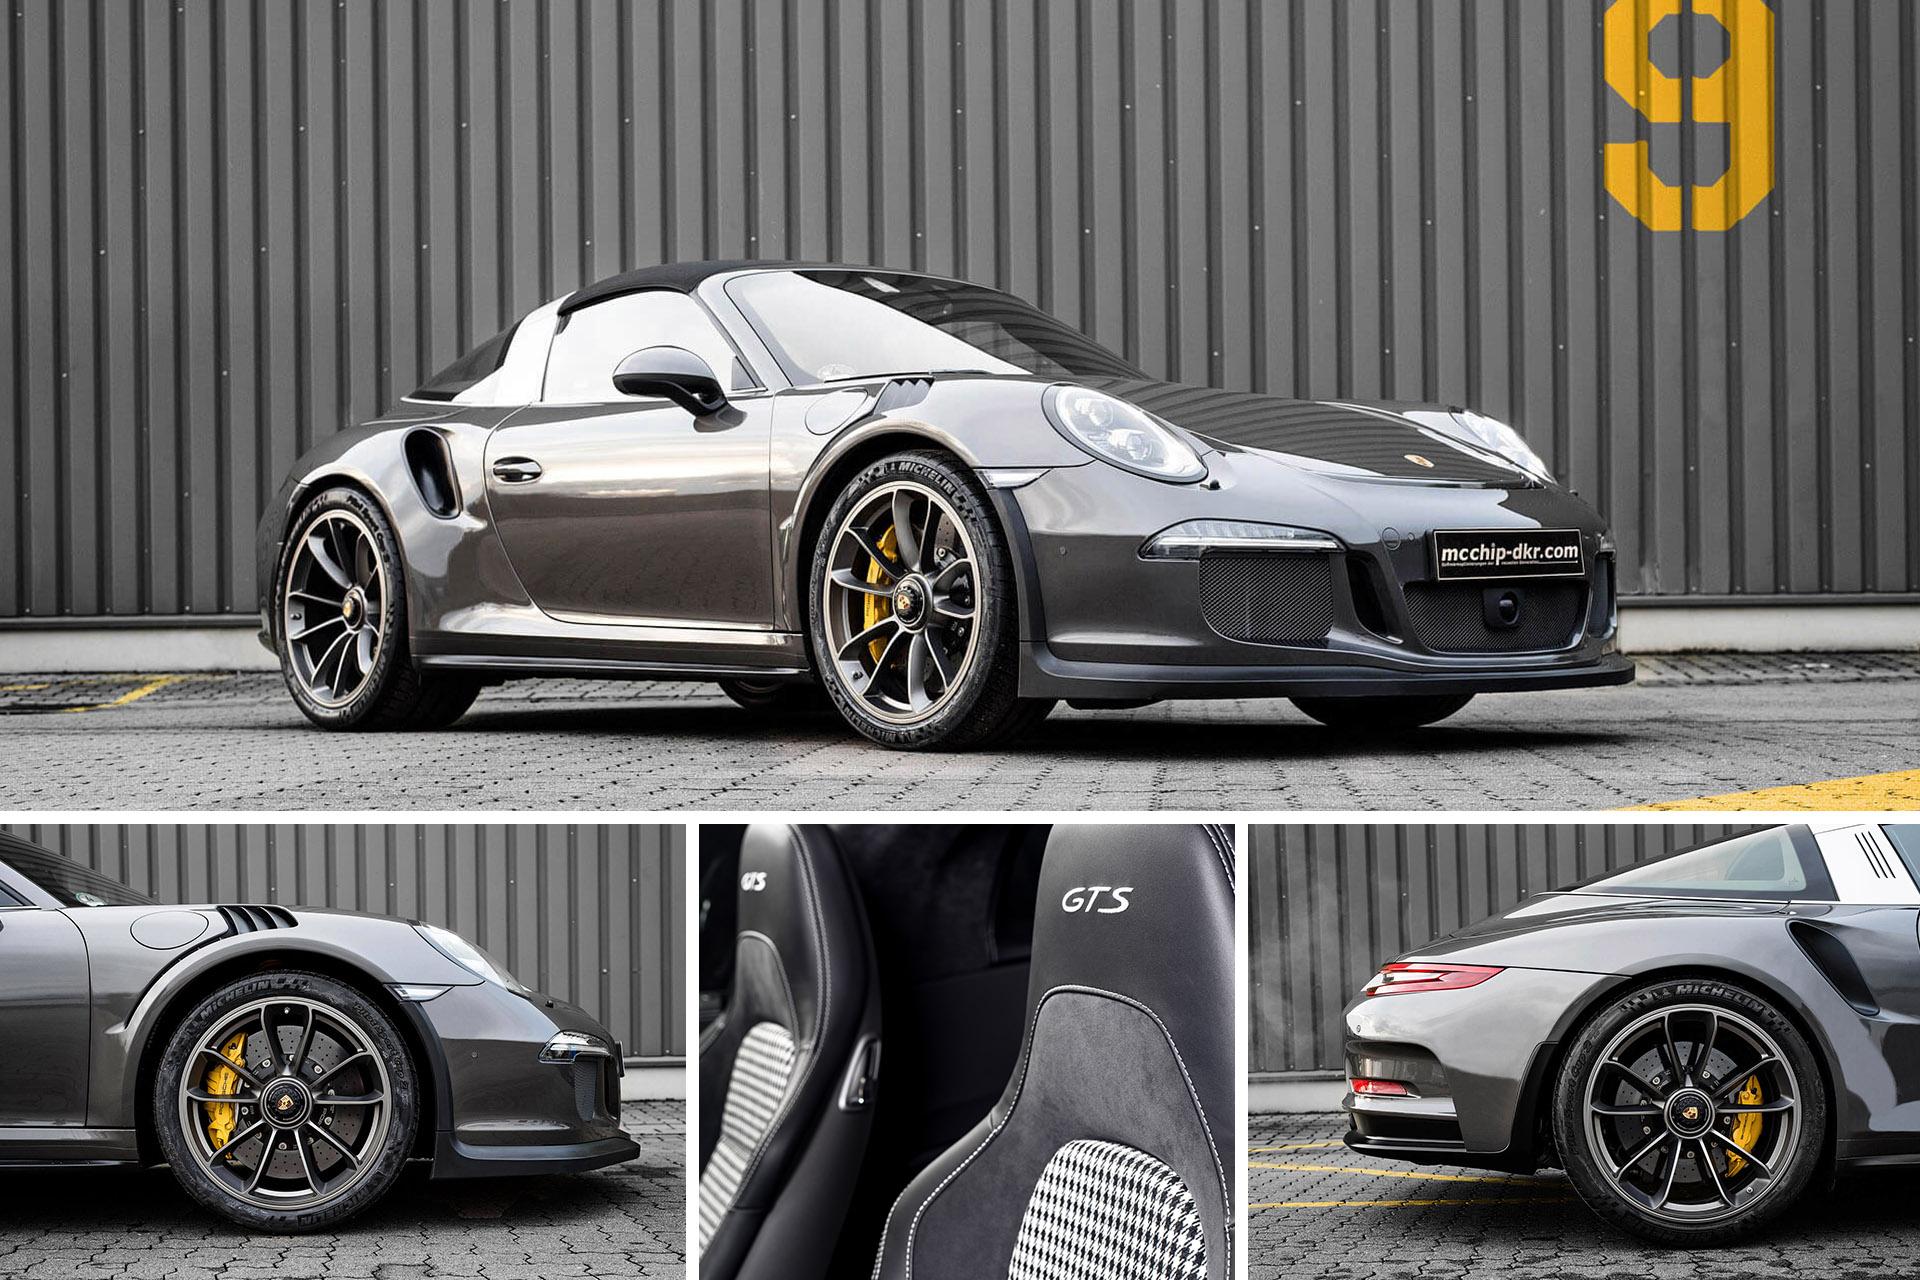 Porsche 991 Targa 4 Gts Conversion To Gt3 Rs Part 3 Completion